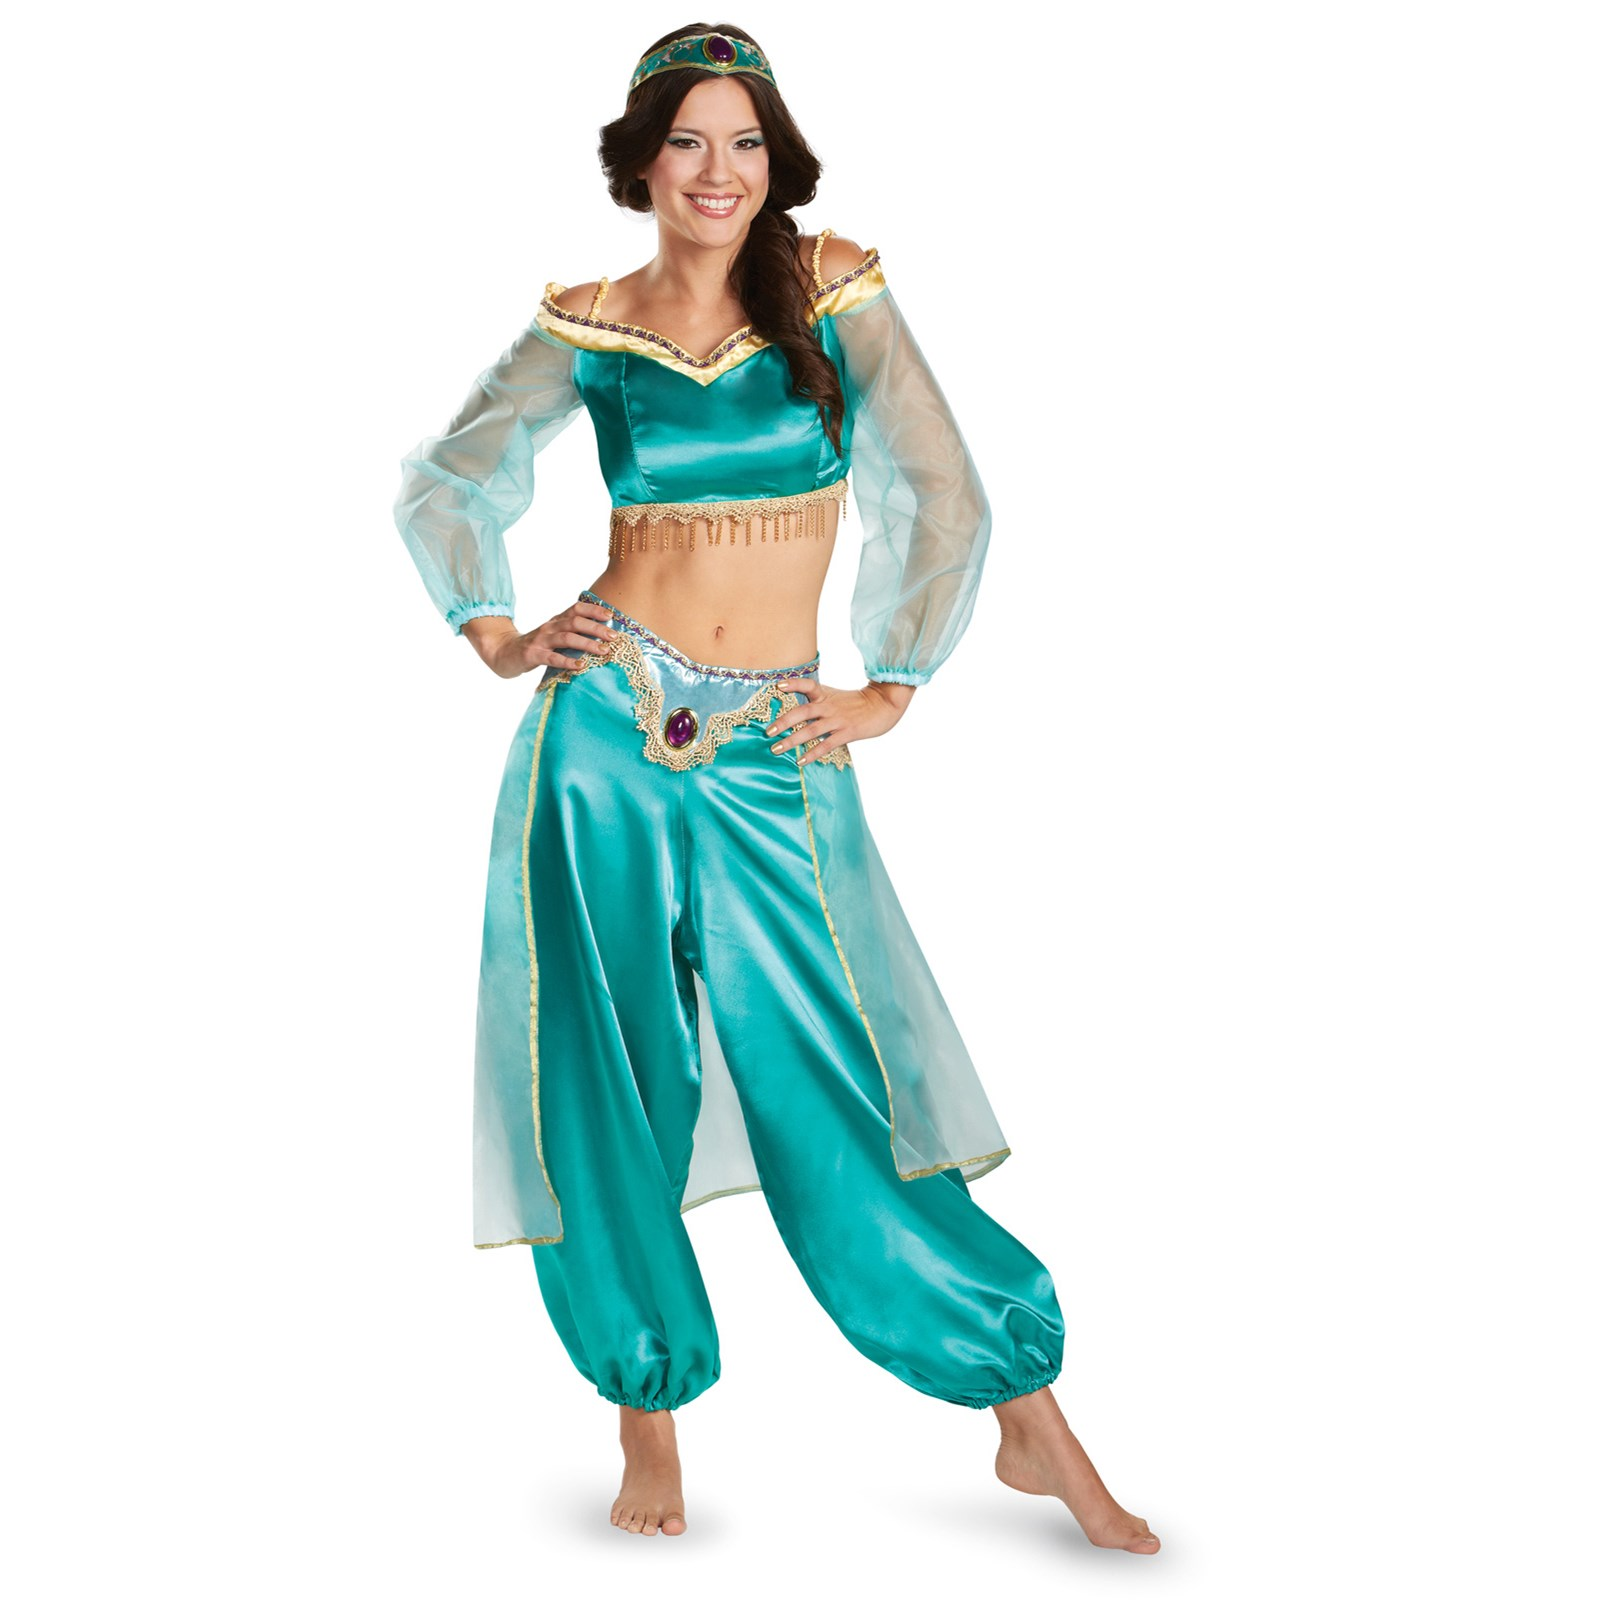 Hot egyptian belly dancer 2